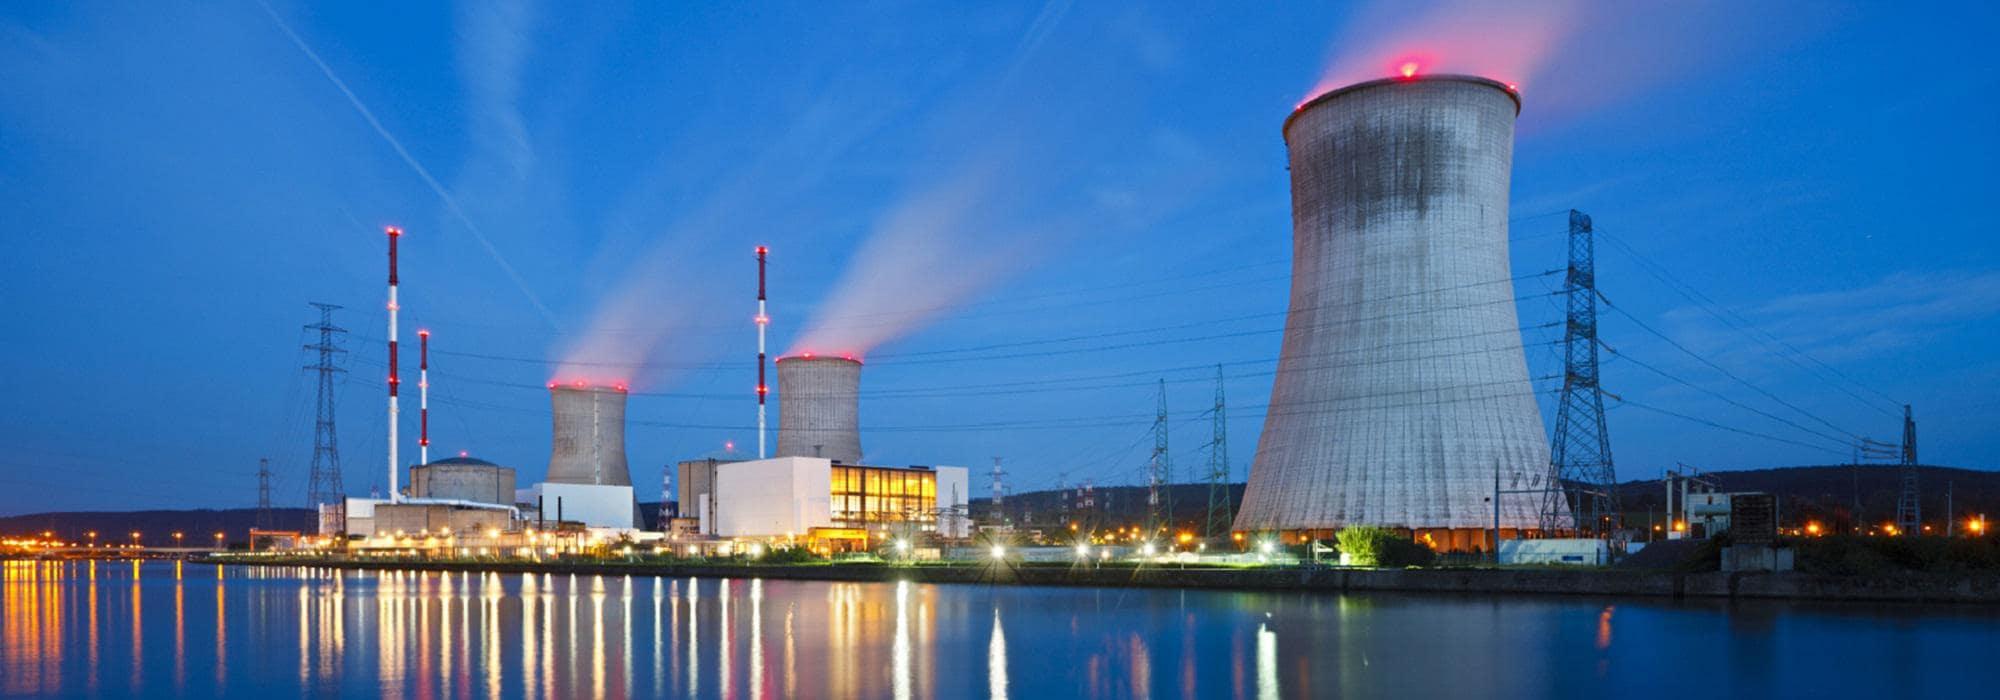 Marechal Plugs & Sockets Power Generation